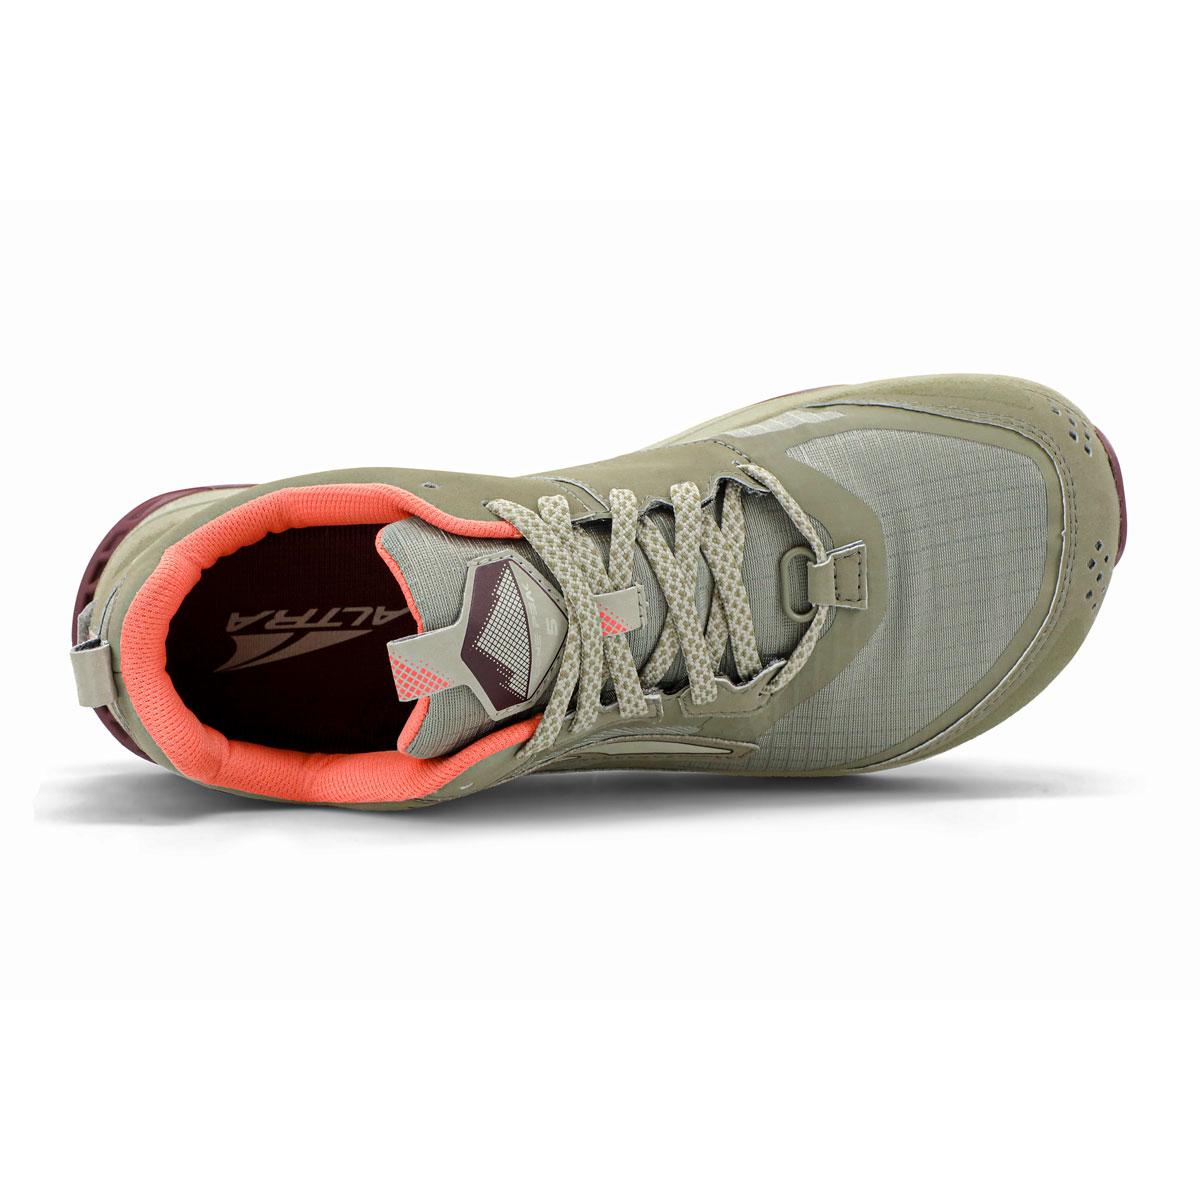 Women's Altra Lone Peak 5 Trail Running Shoe - Color: Khaki - Size: 5.5 - Width: Regular, Khaki, large, image 3